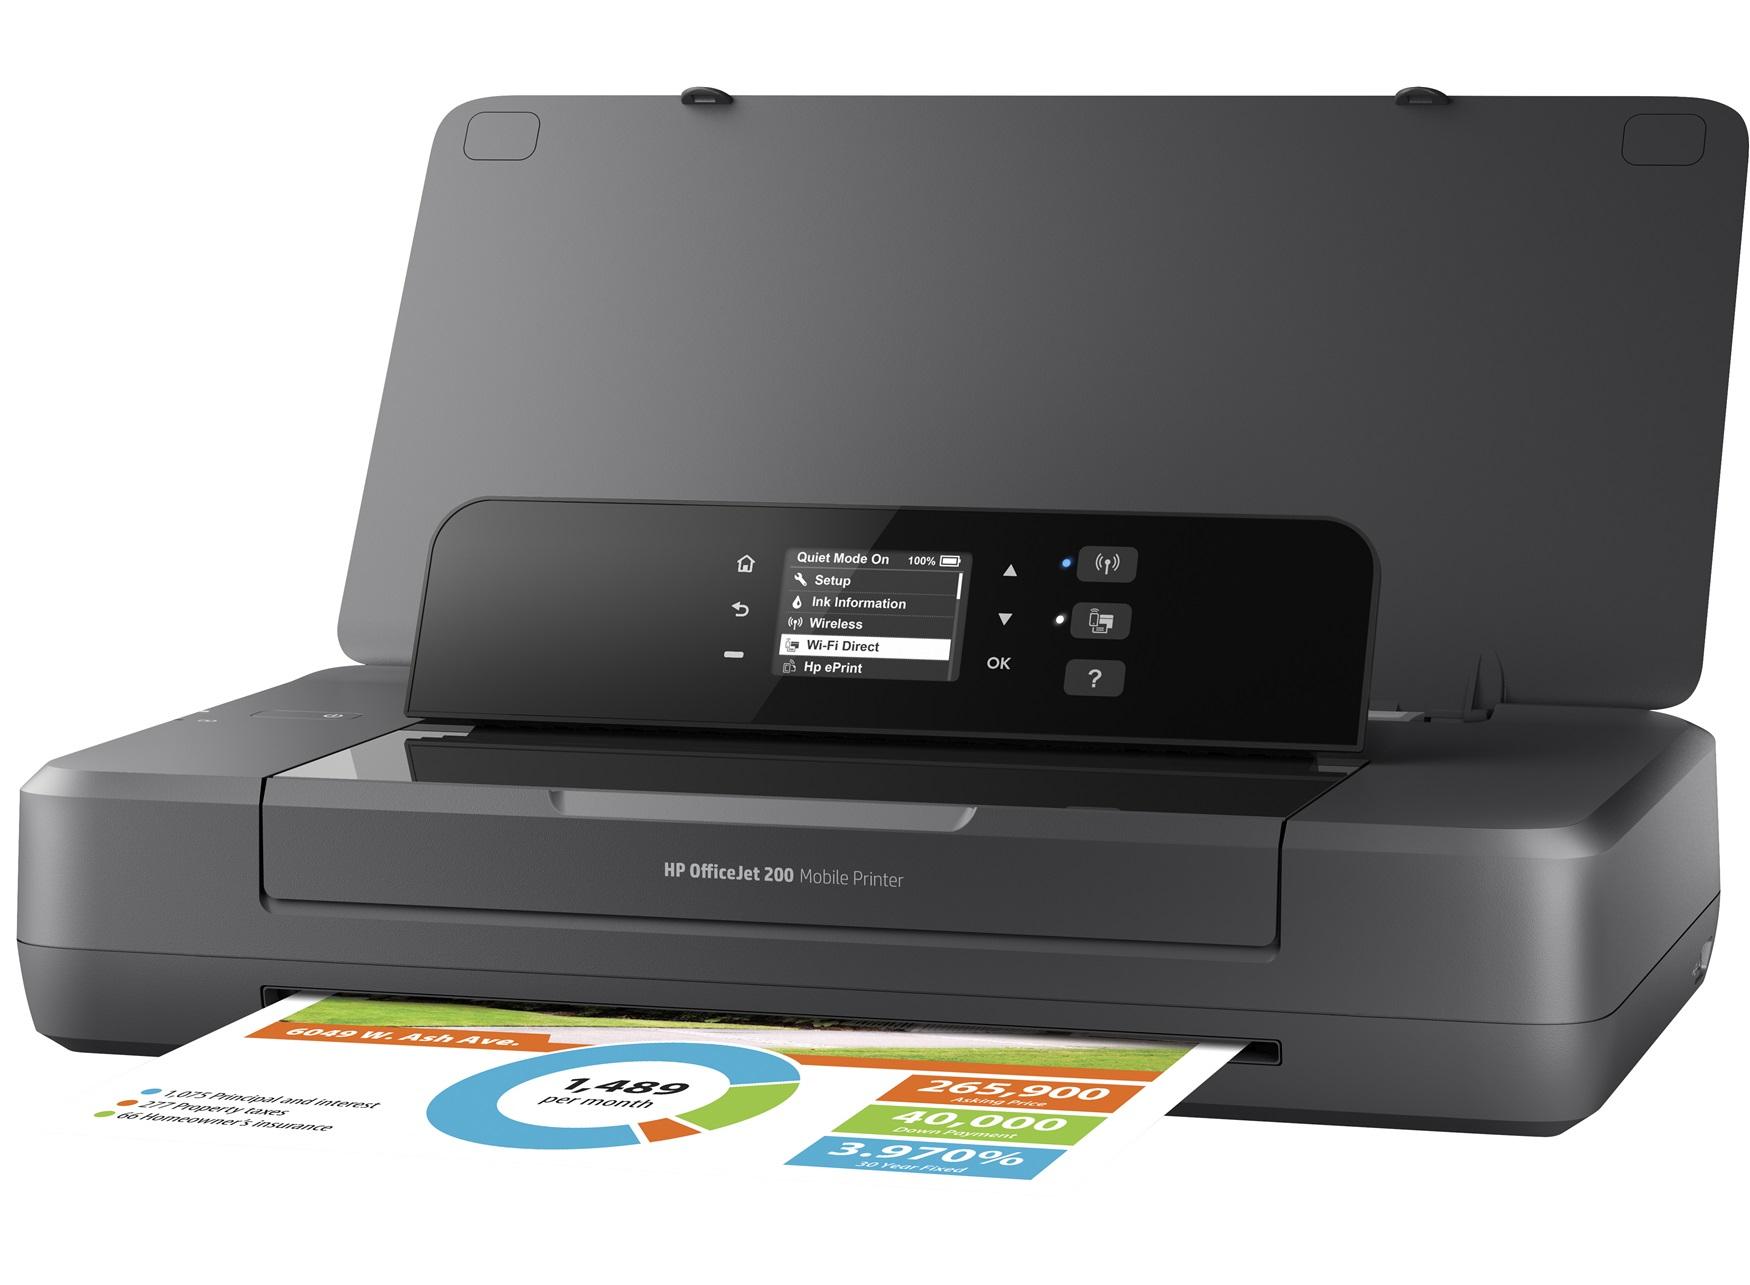 hp inc officejet 200 mobile printer cz993a bhc. Black Bedroom Furniture Sets. Home Design Ideas